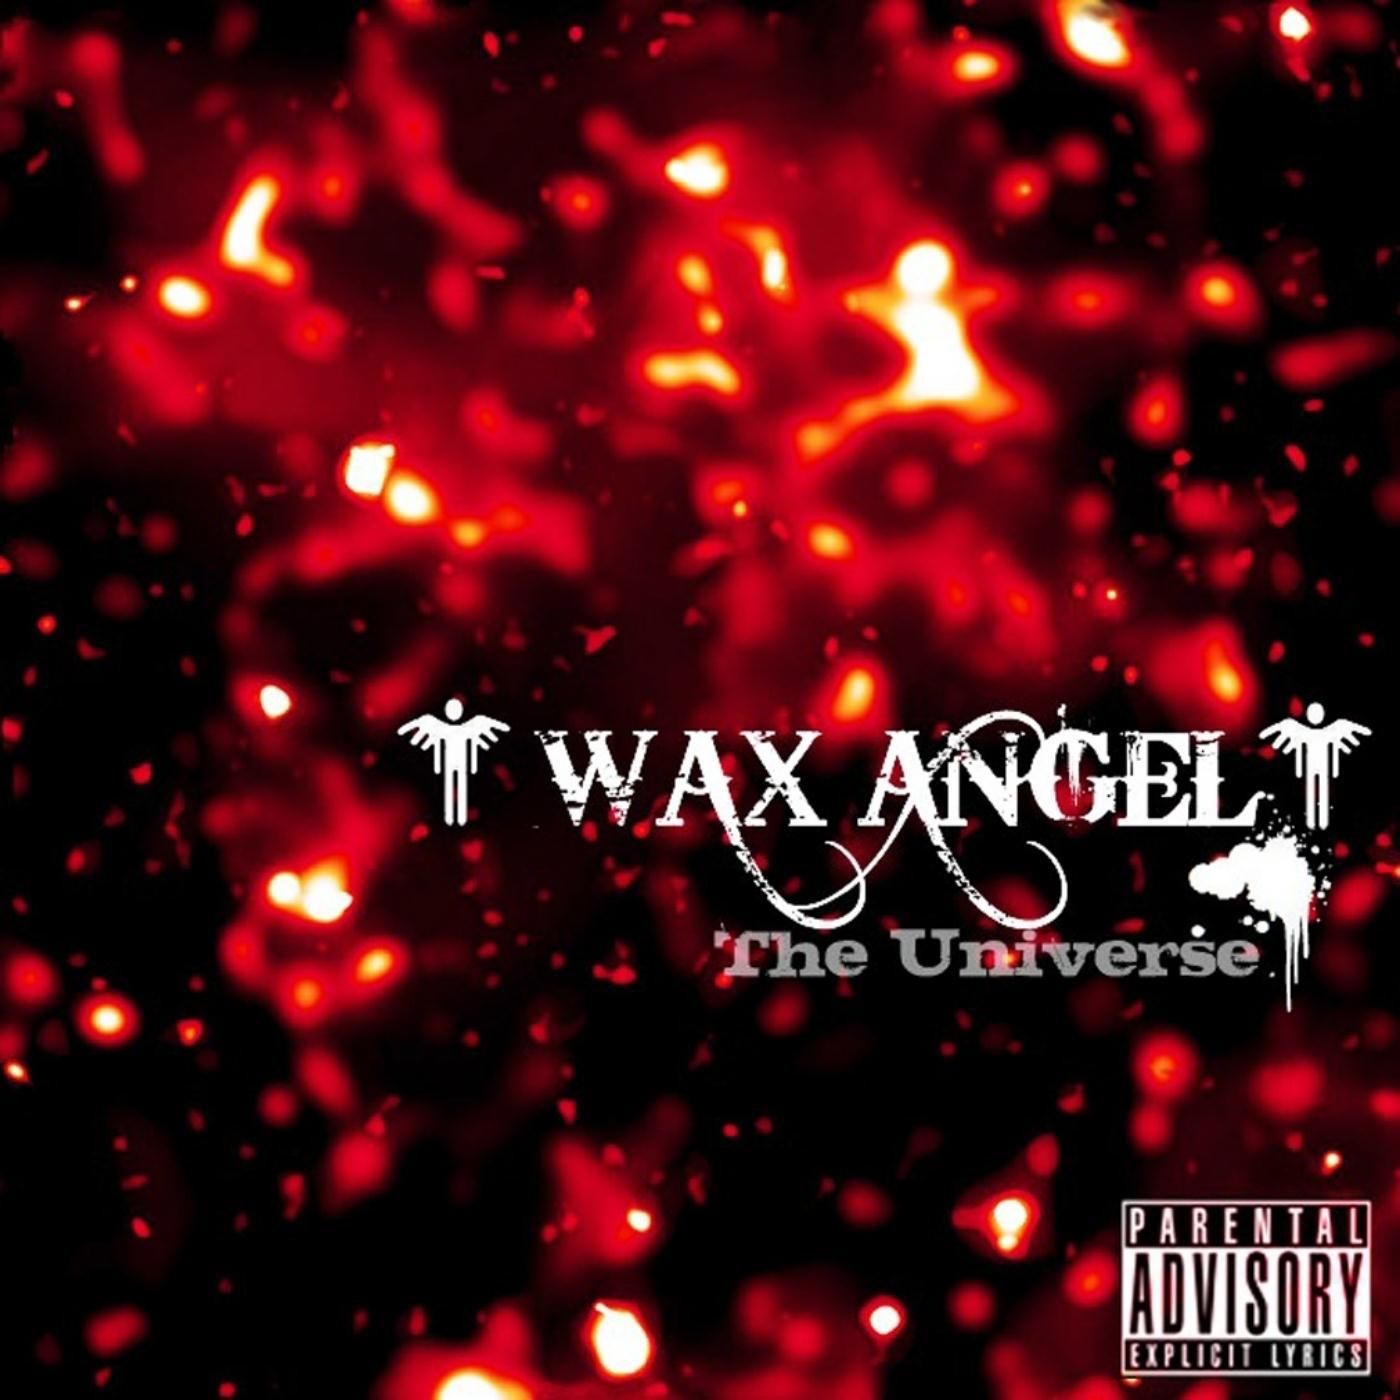 Wax Angel album The Universe